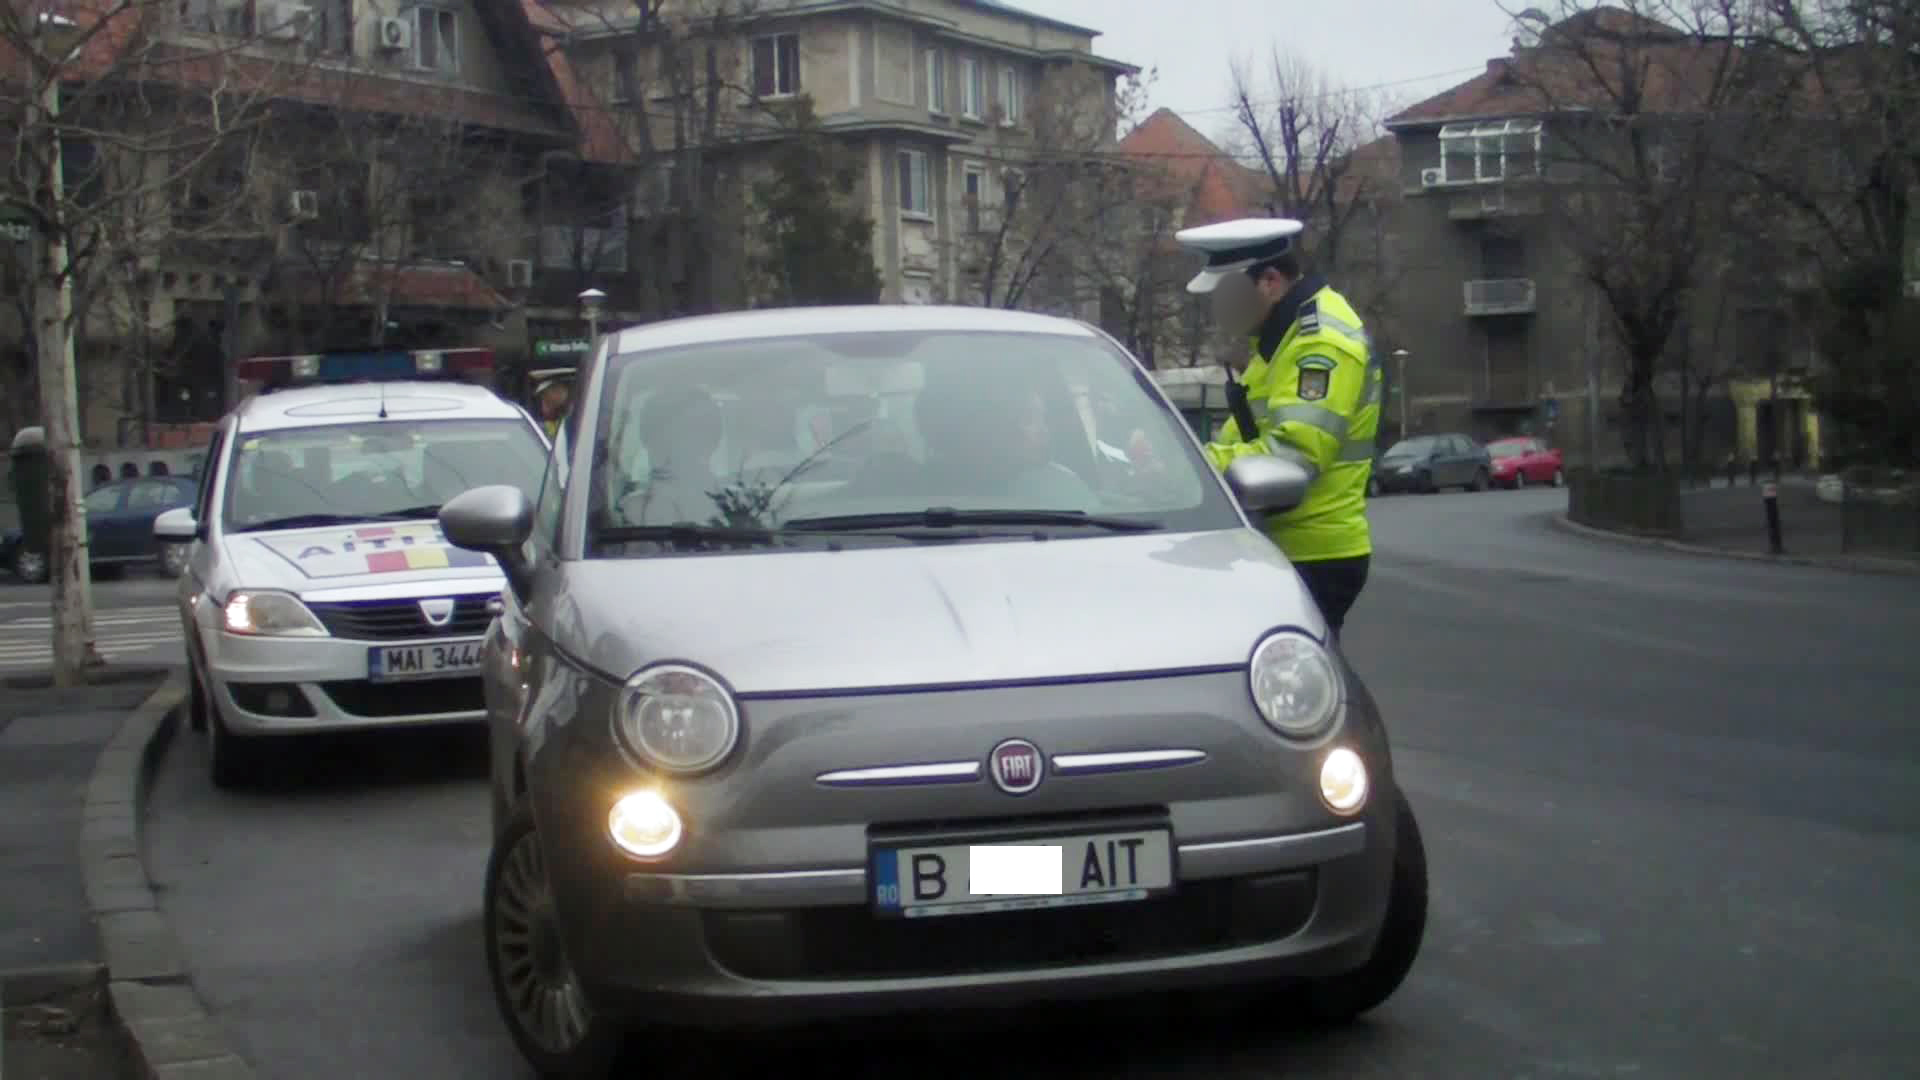 Vedeta a fost trasa pe dreapta de un echipaj de politie